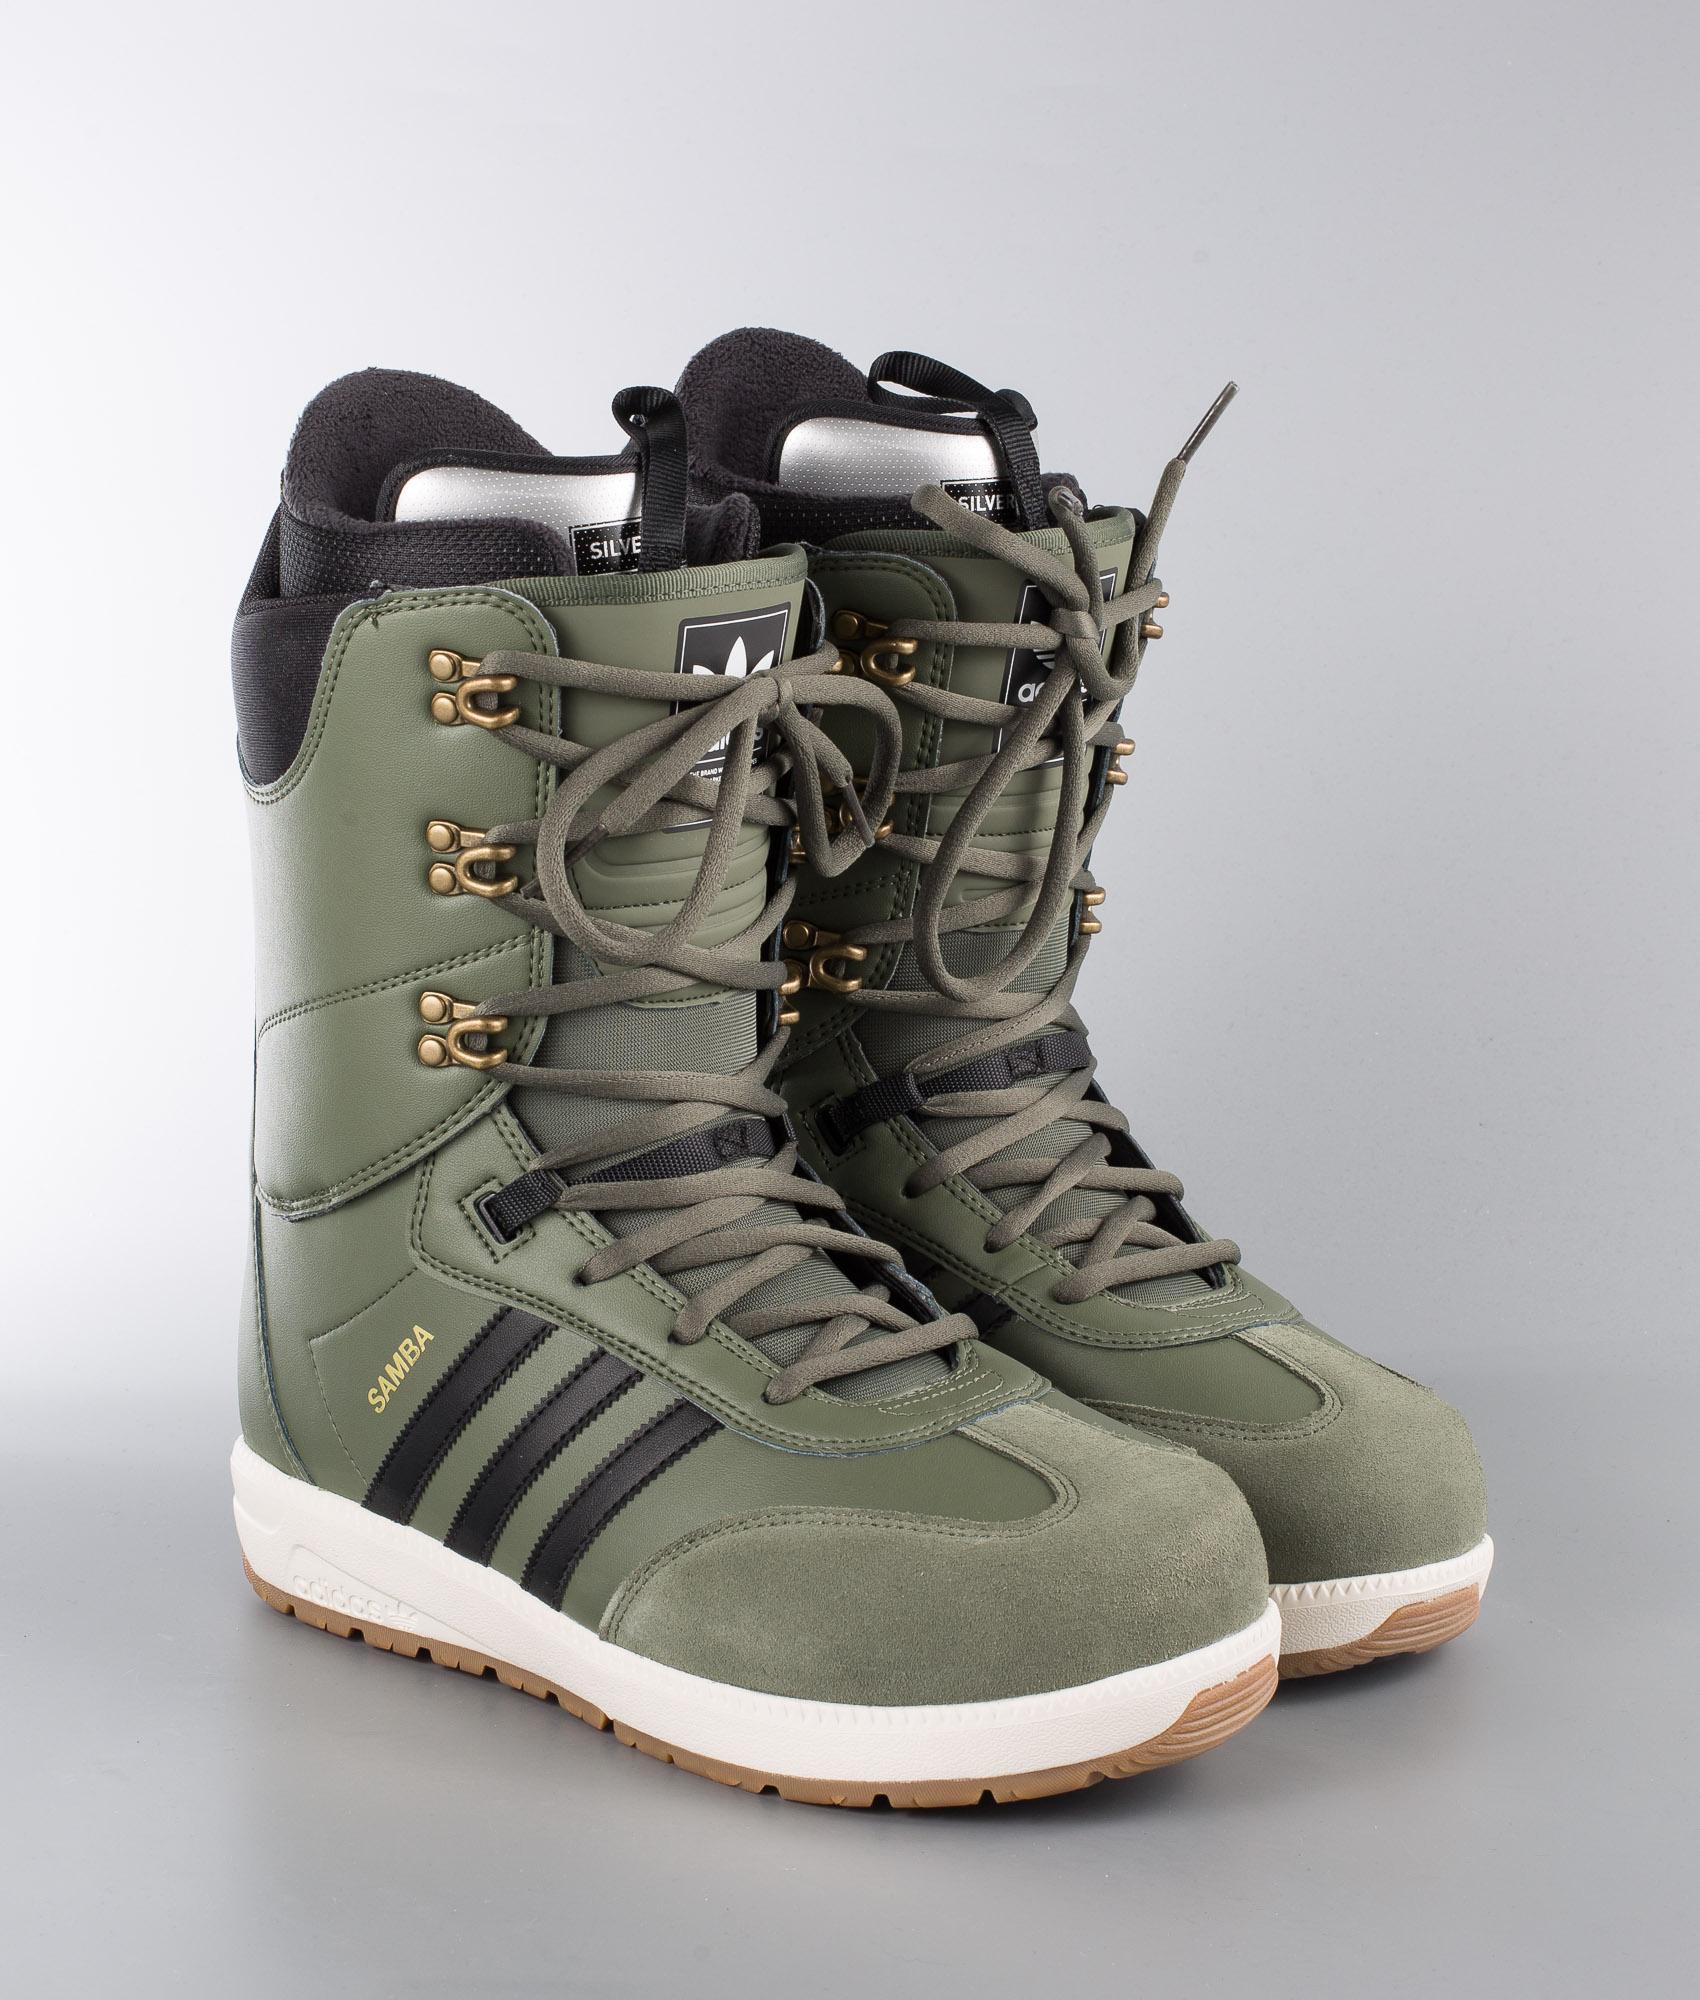 Adidas Snowboarding Samba Adv Boots Base GreenCore BlackOwhite